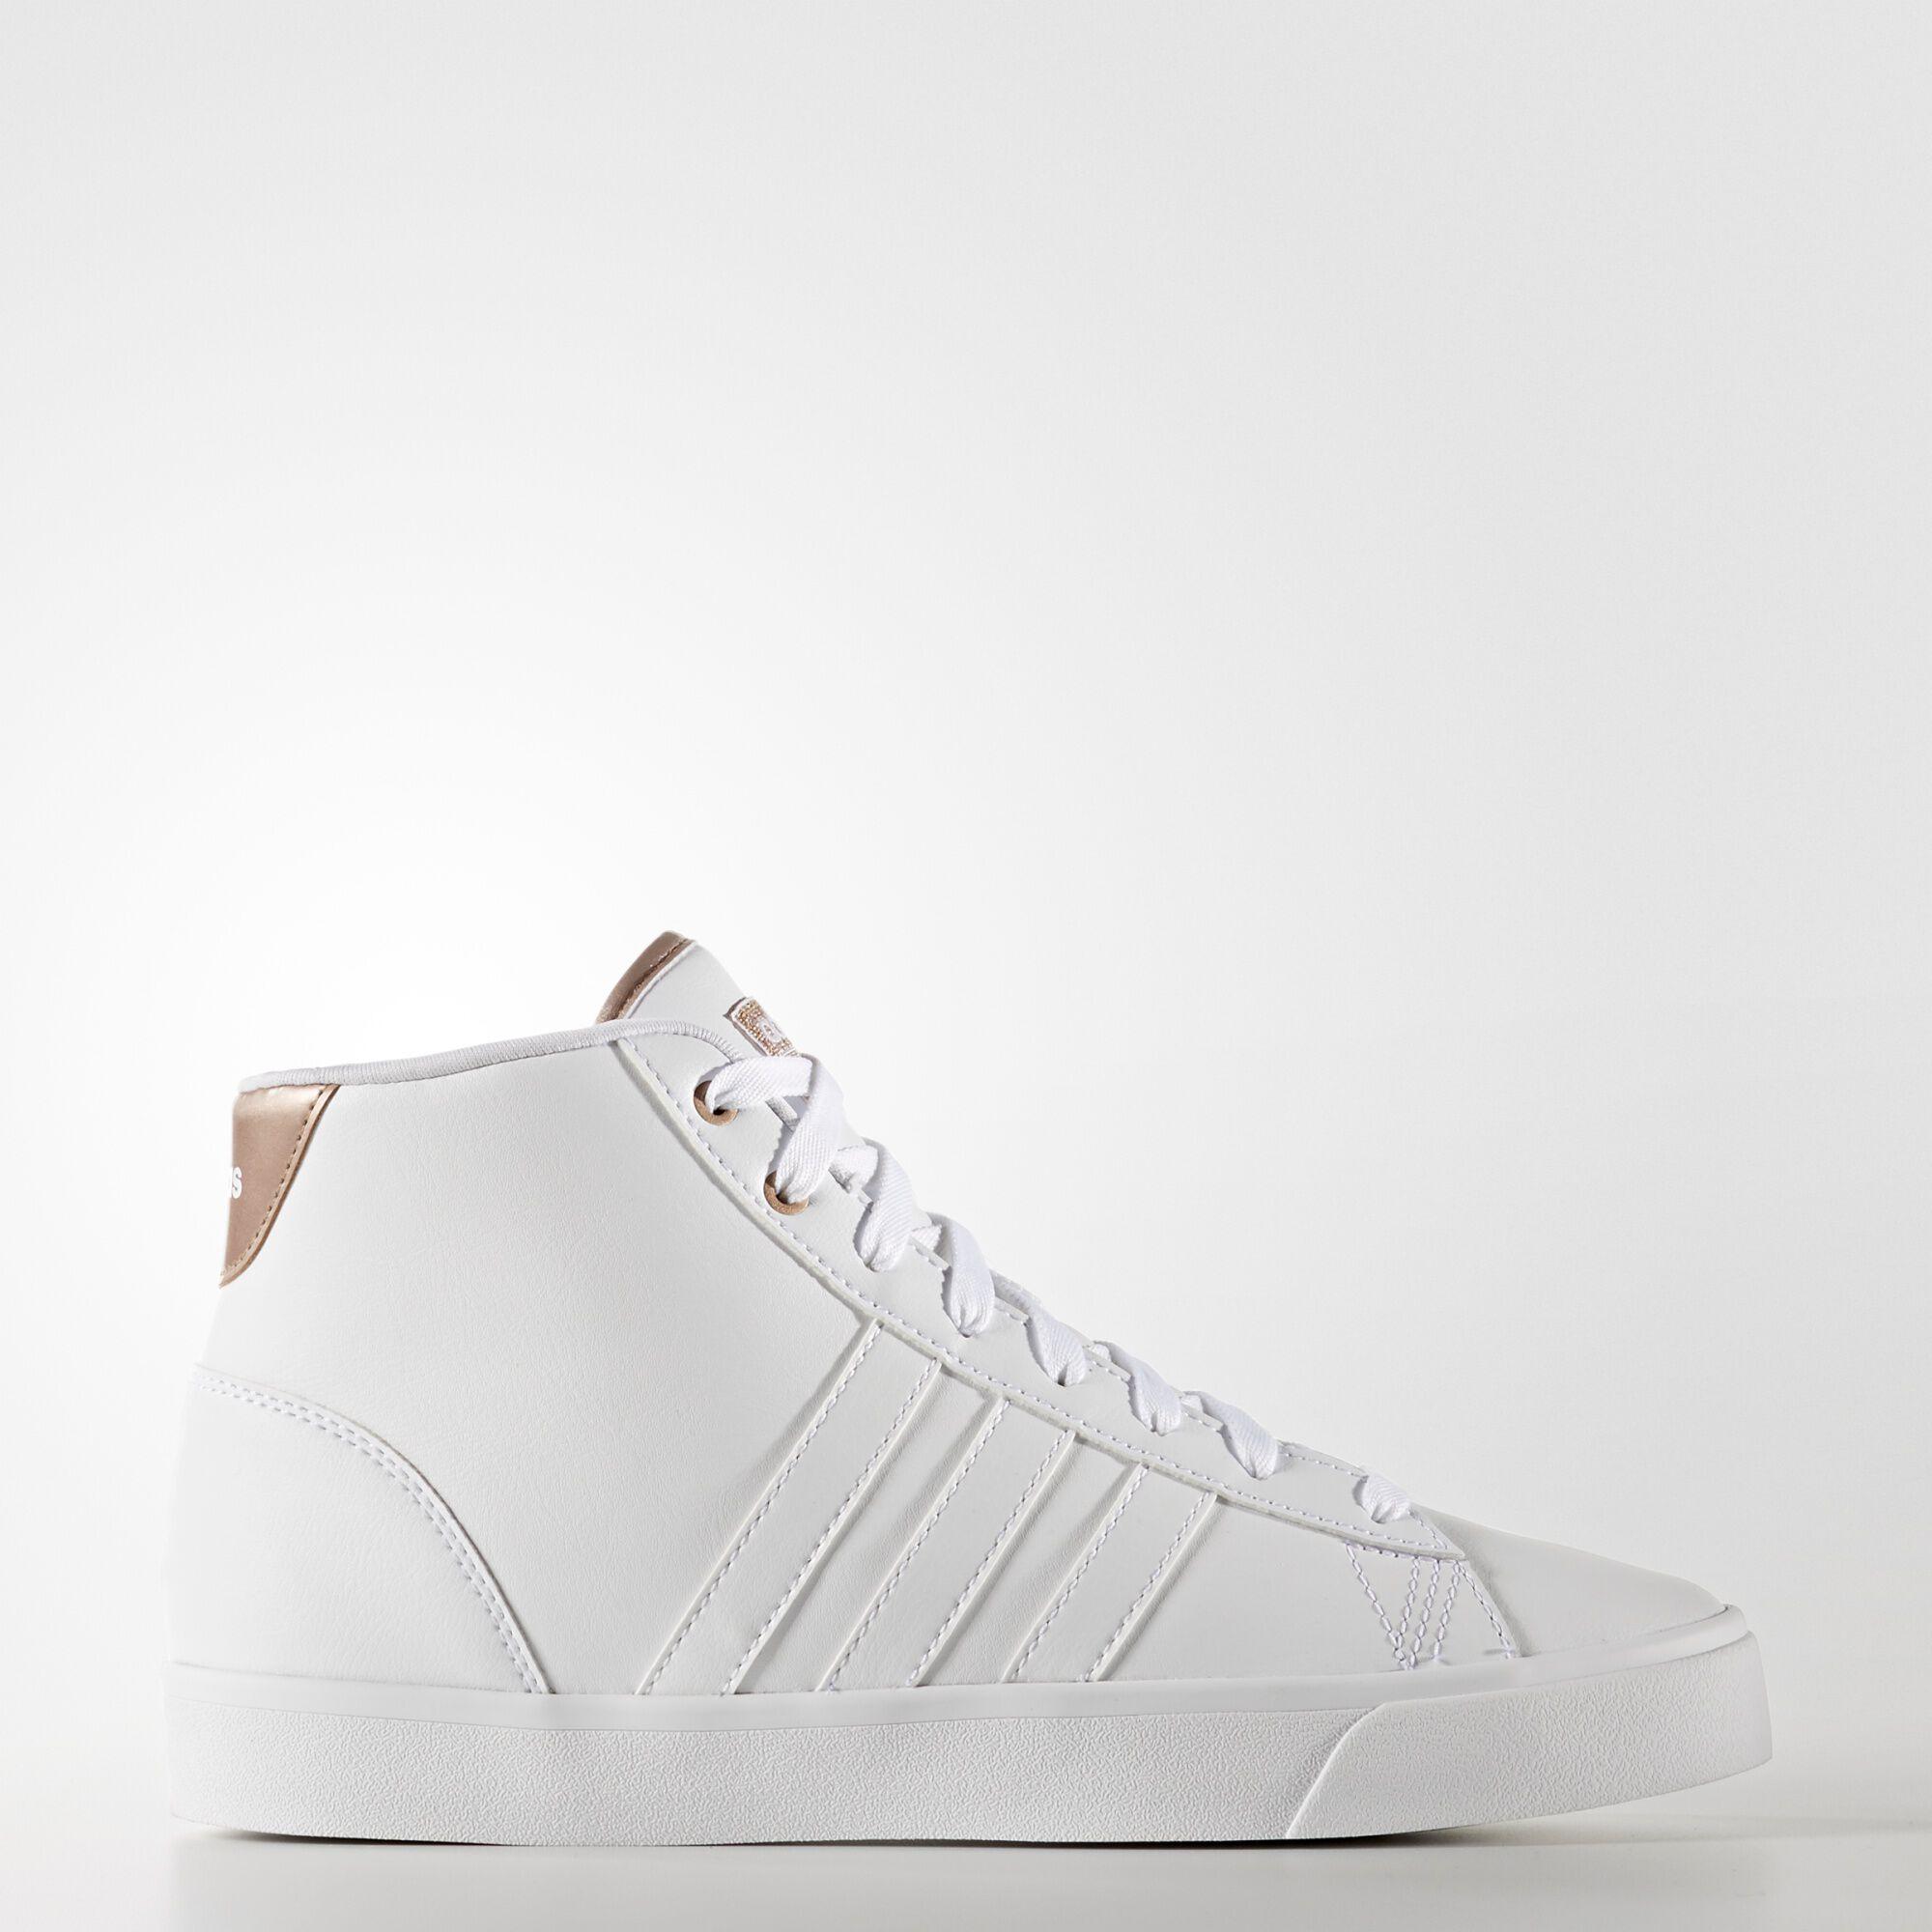 Adidas Cloudfoam Daily QT Mid Shoes - White